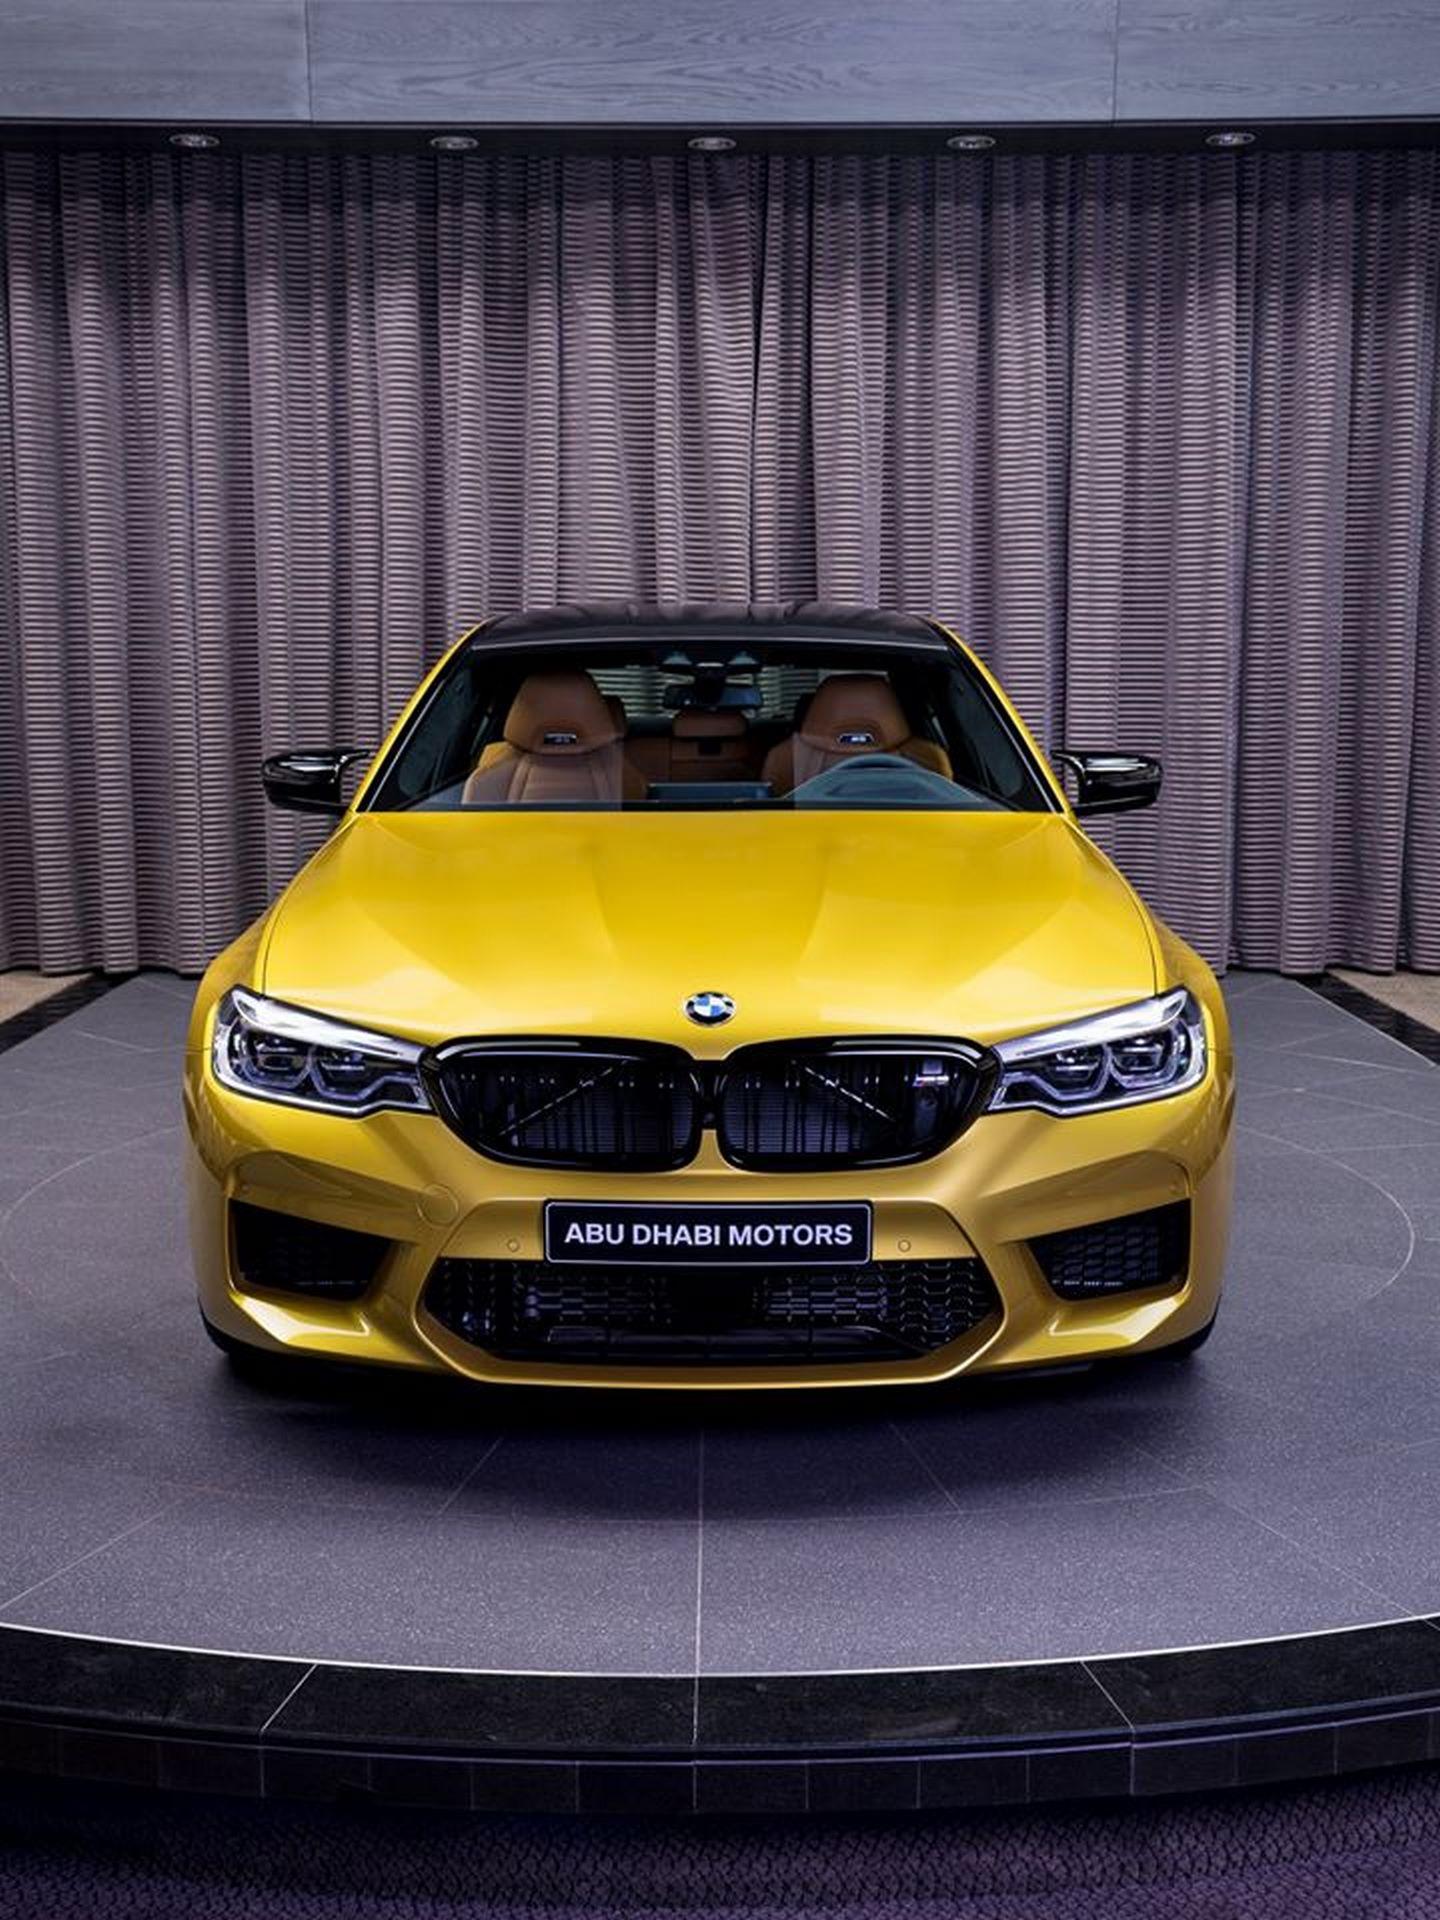 BMW-M5-Competition-Austin-Yellow-Abu-Dhabi-Motors-2